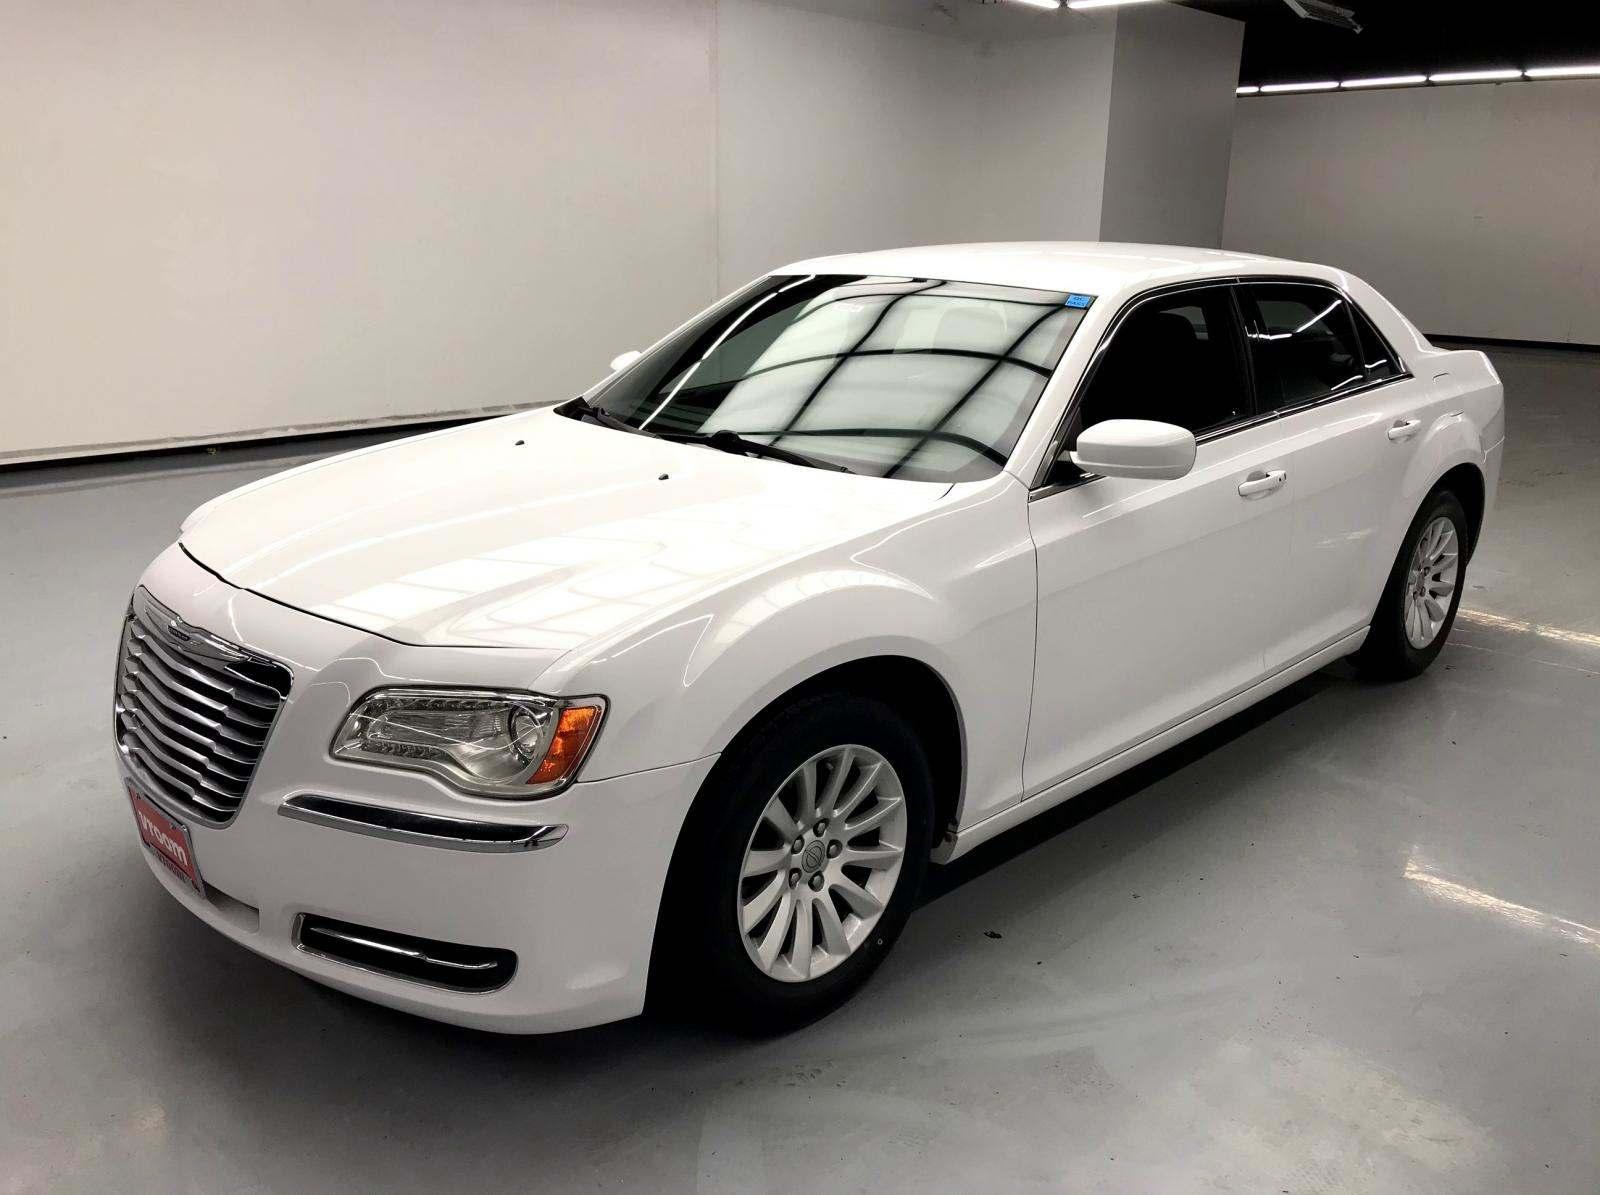 2013 Chrysler 300 For Sale >> Used 2013 Chrysler 300 For Sale 12 790 Vroom